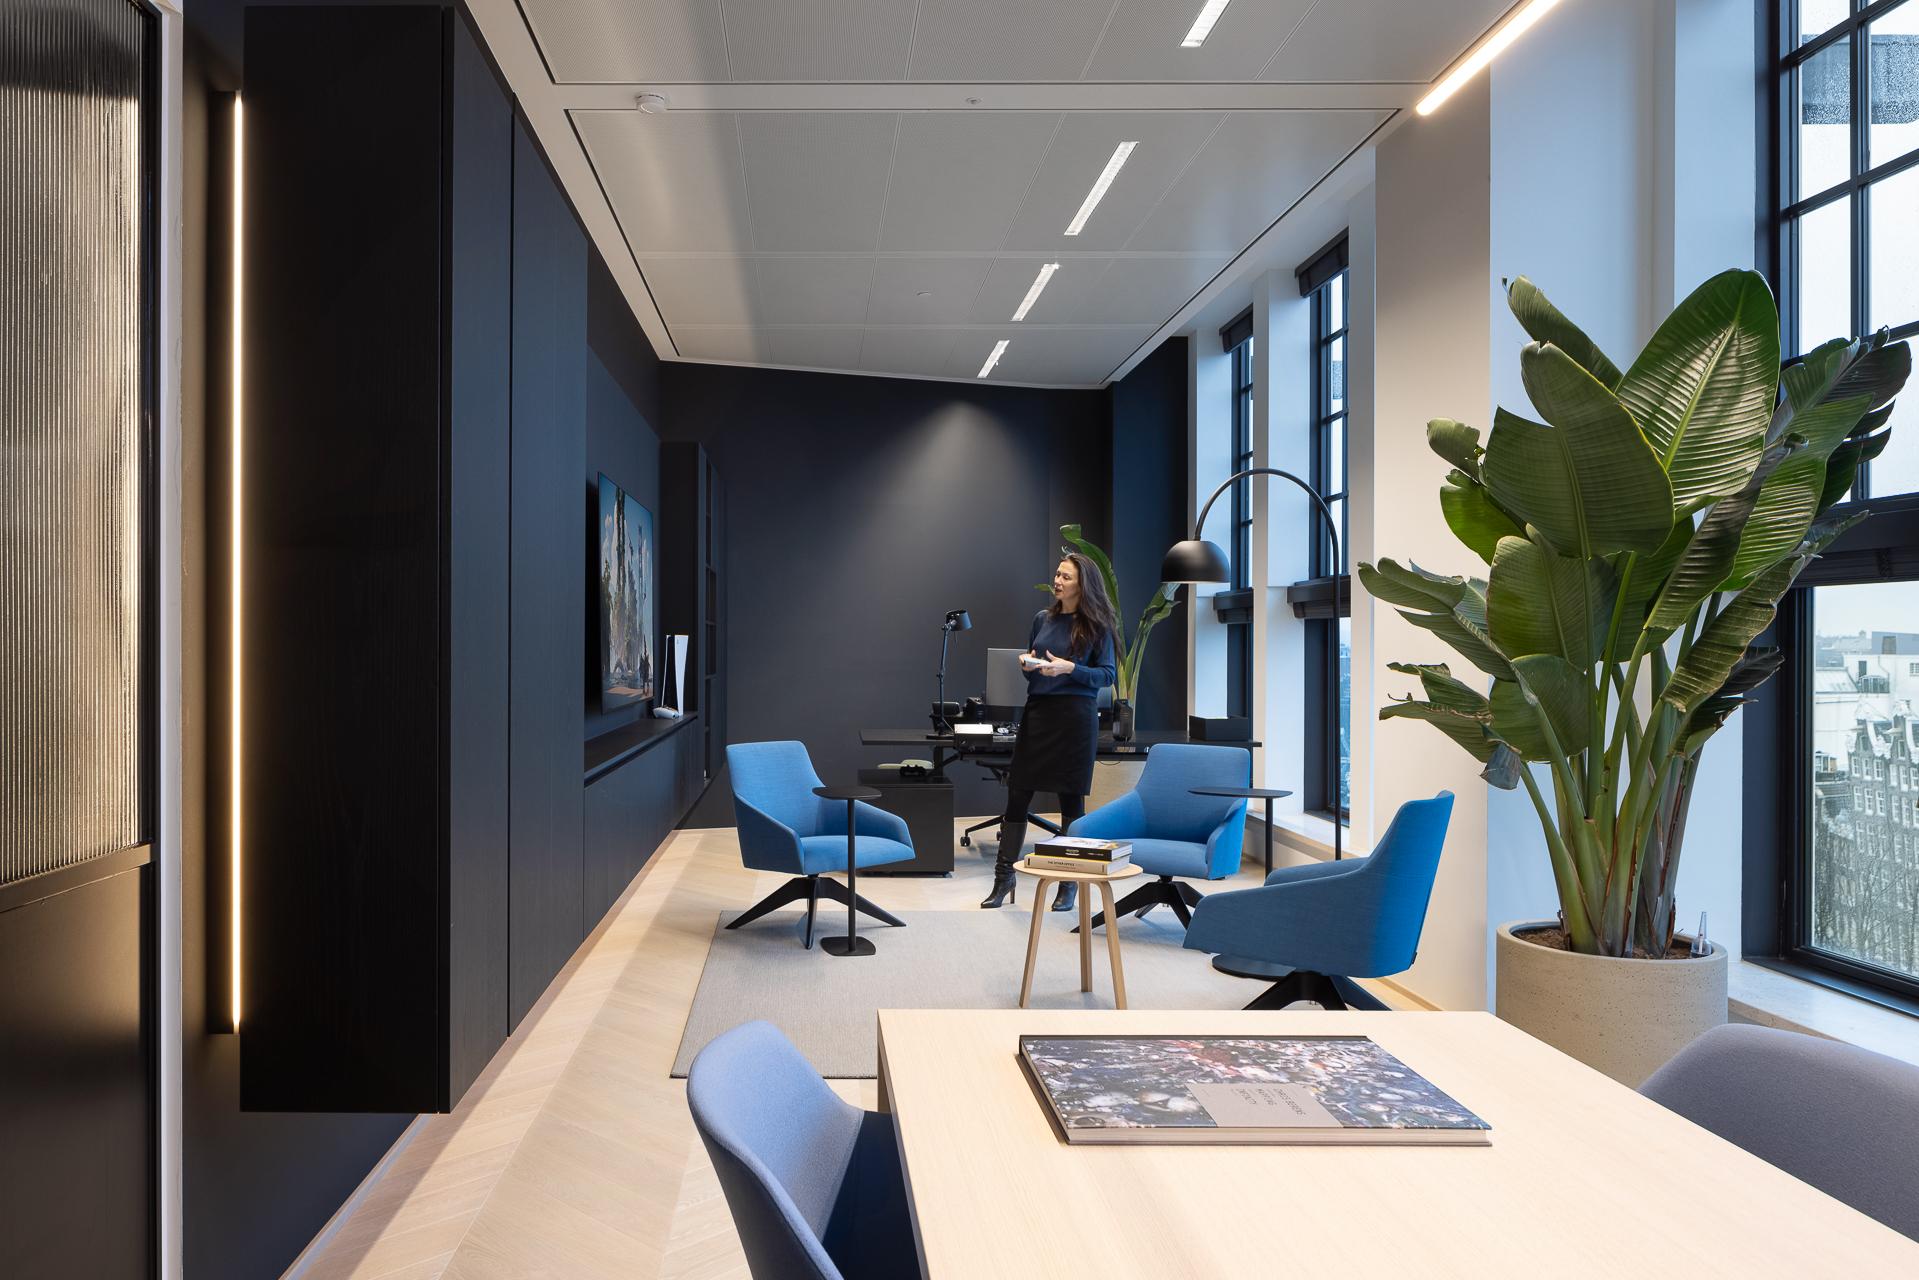 SP2020-Guerrilla-Games-Amsterdam-Office-Interieurfotografie-25